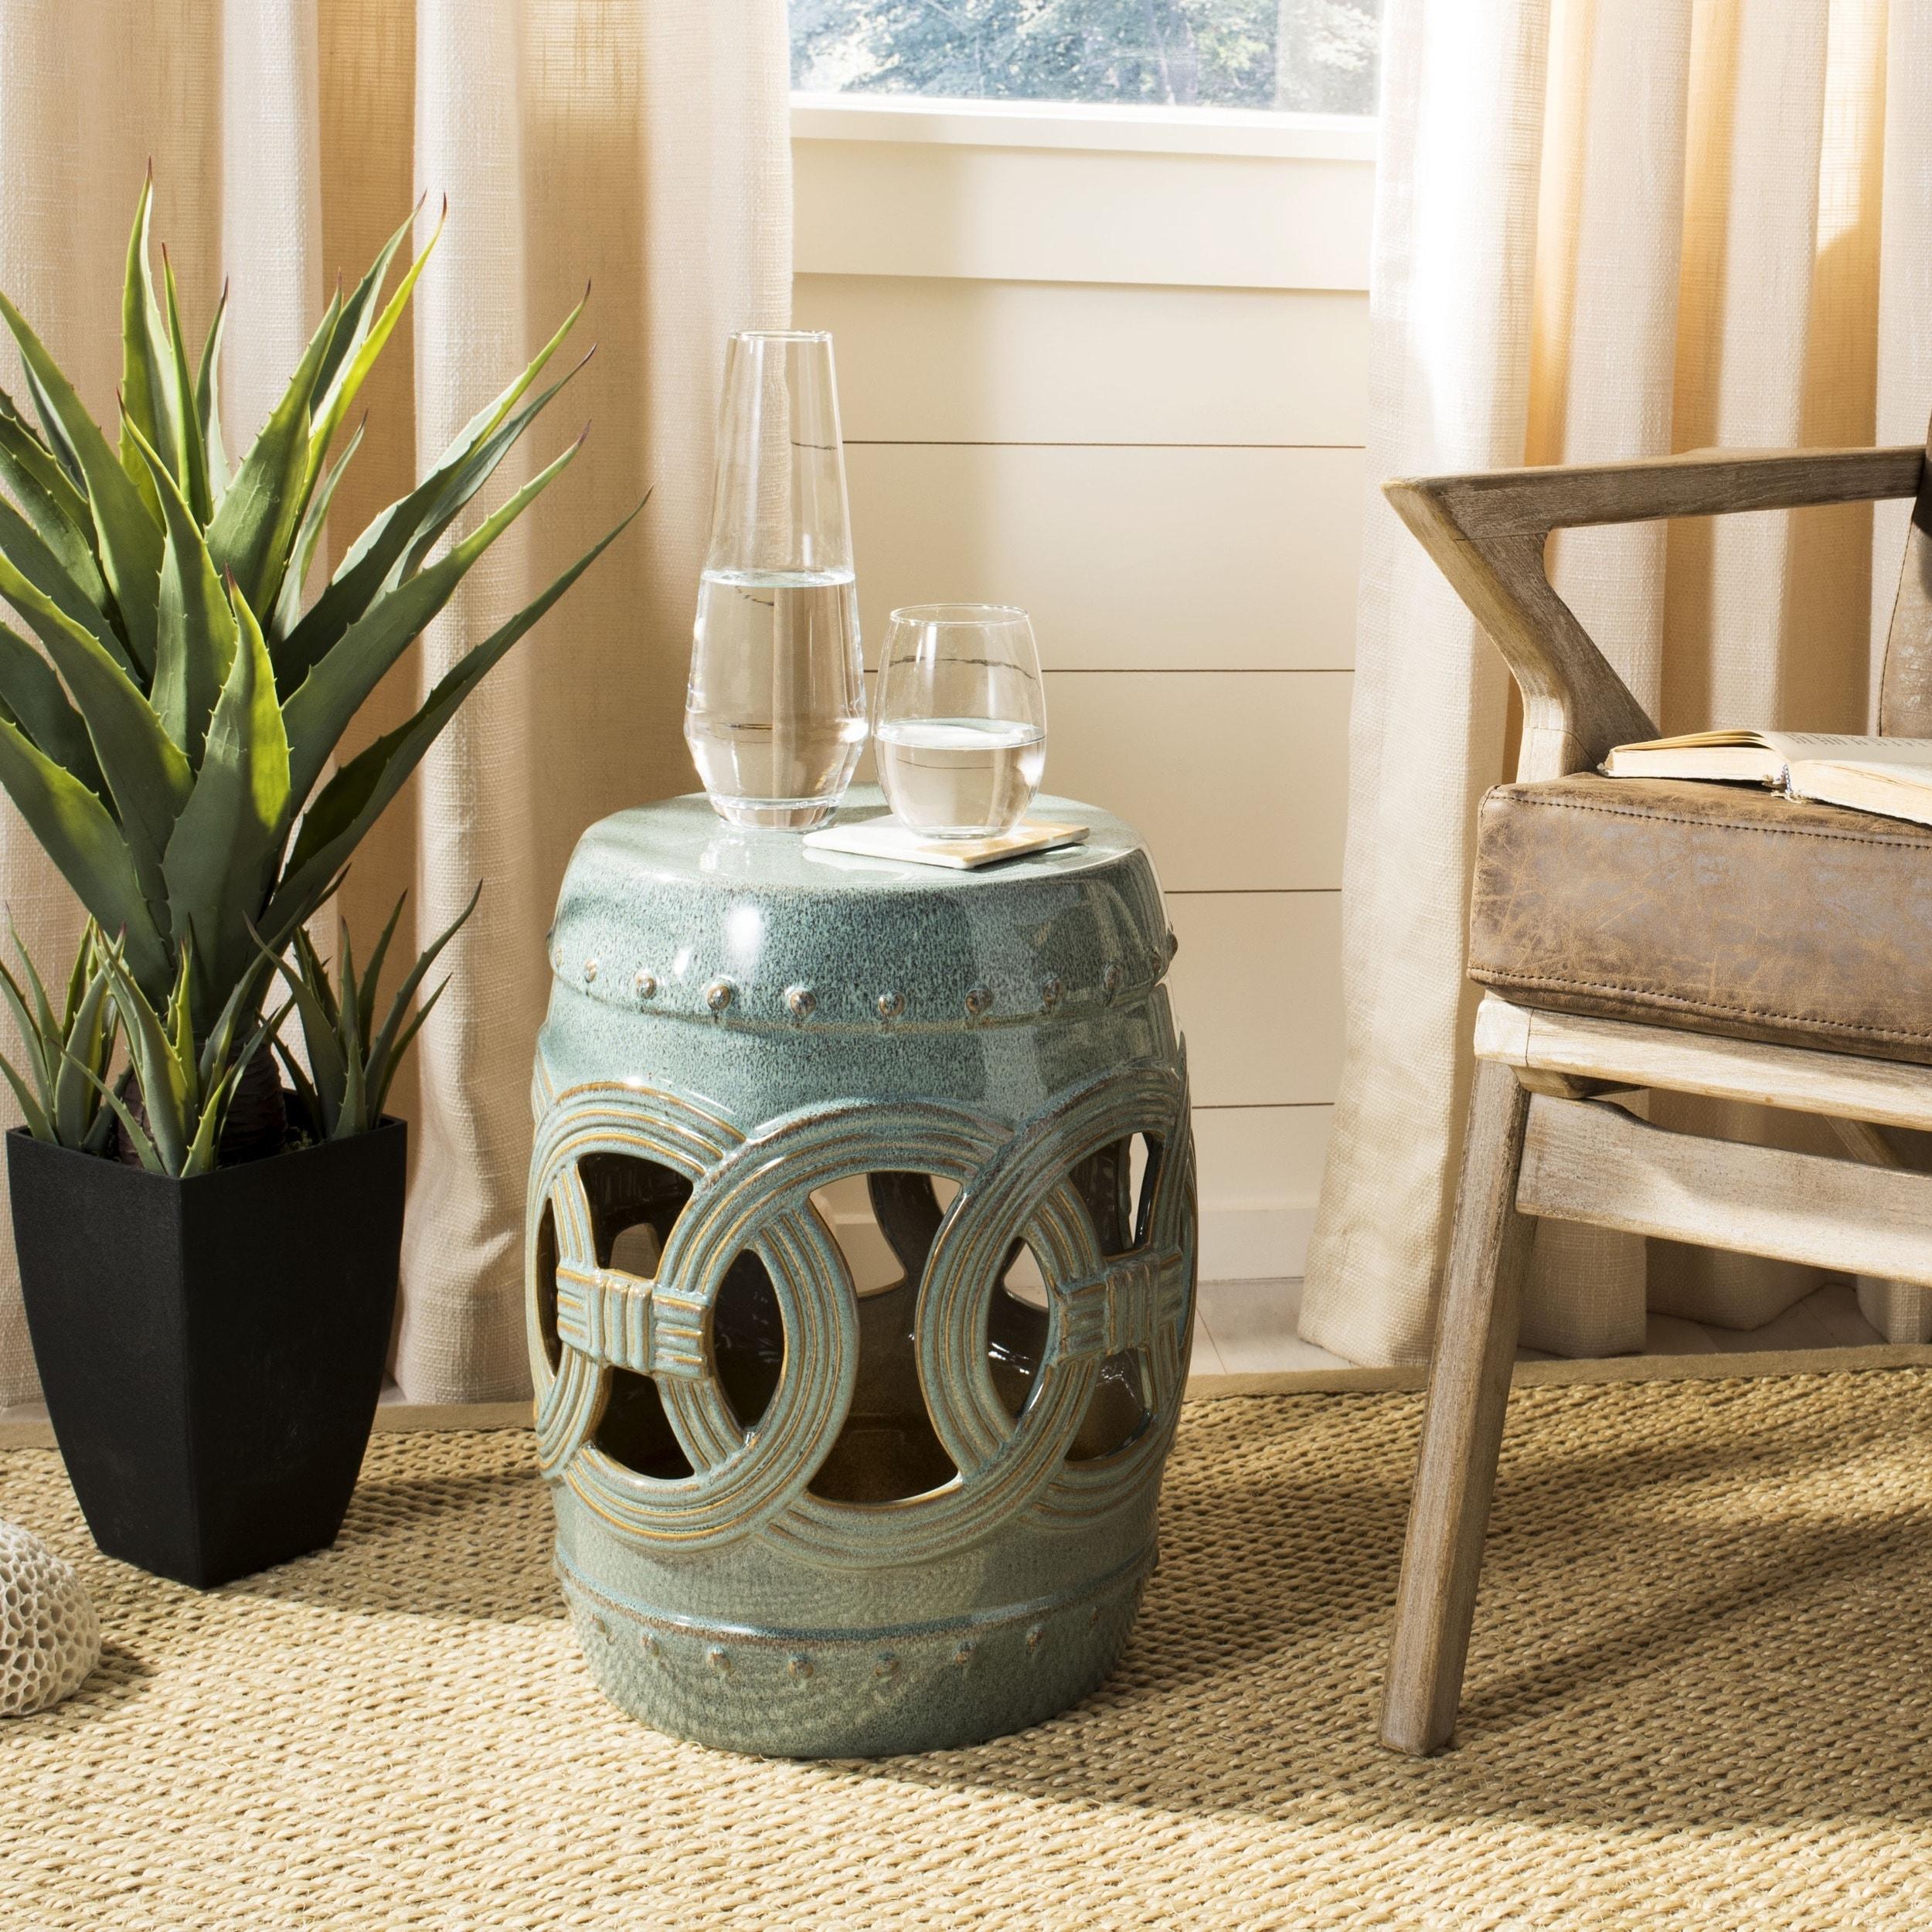 garden orange glaze ceramic living pineapple stool with colonial shop burnt stools seven outdoor